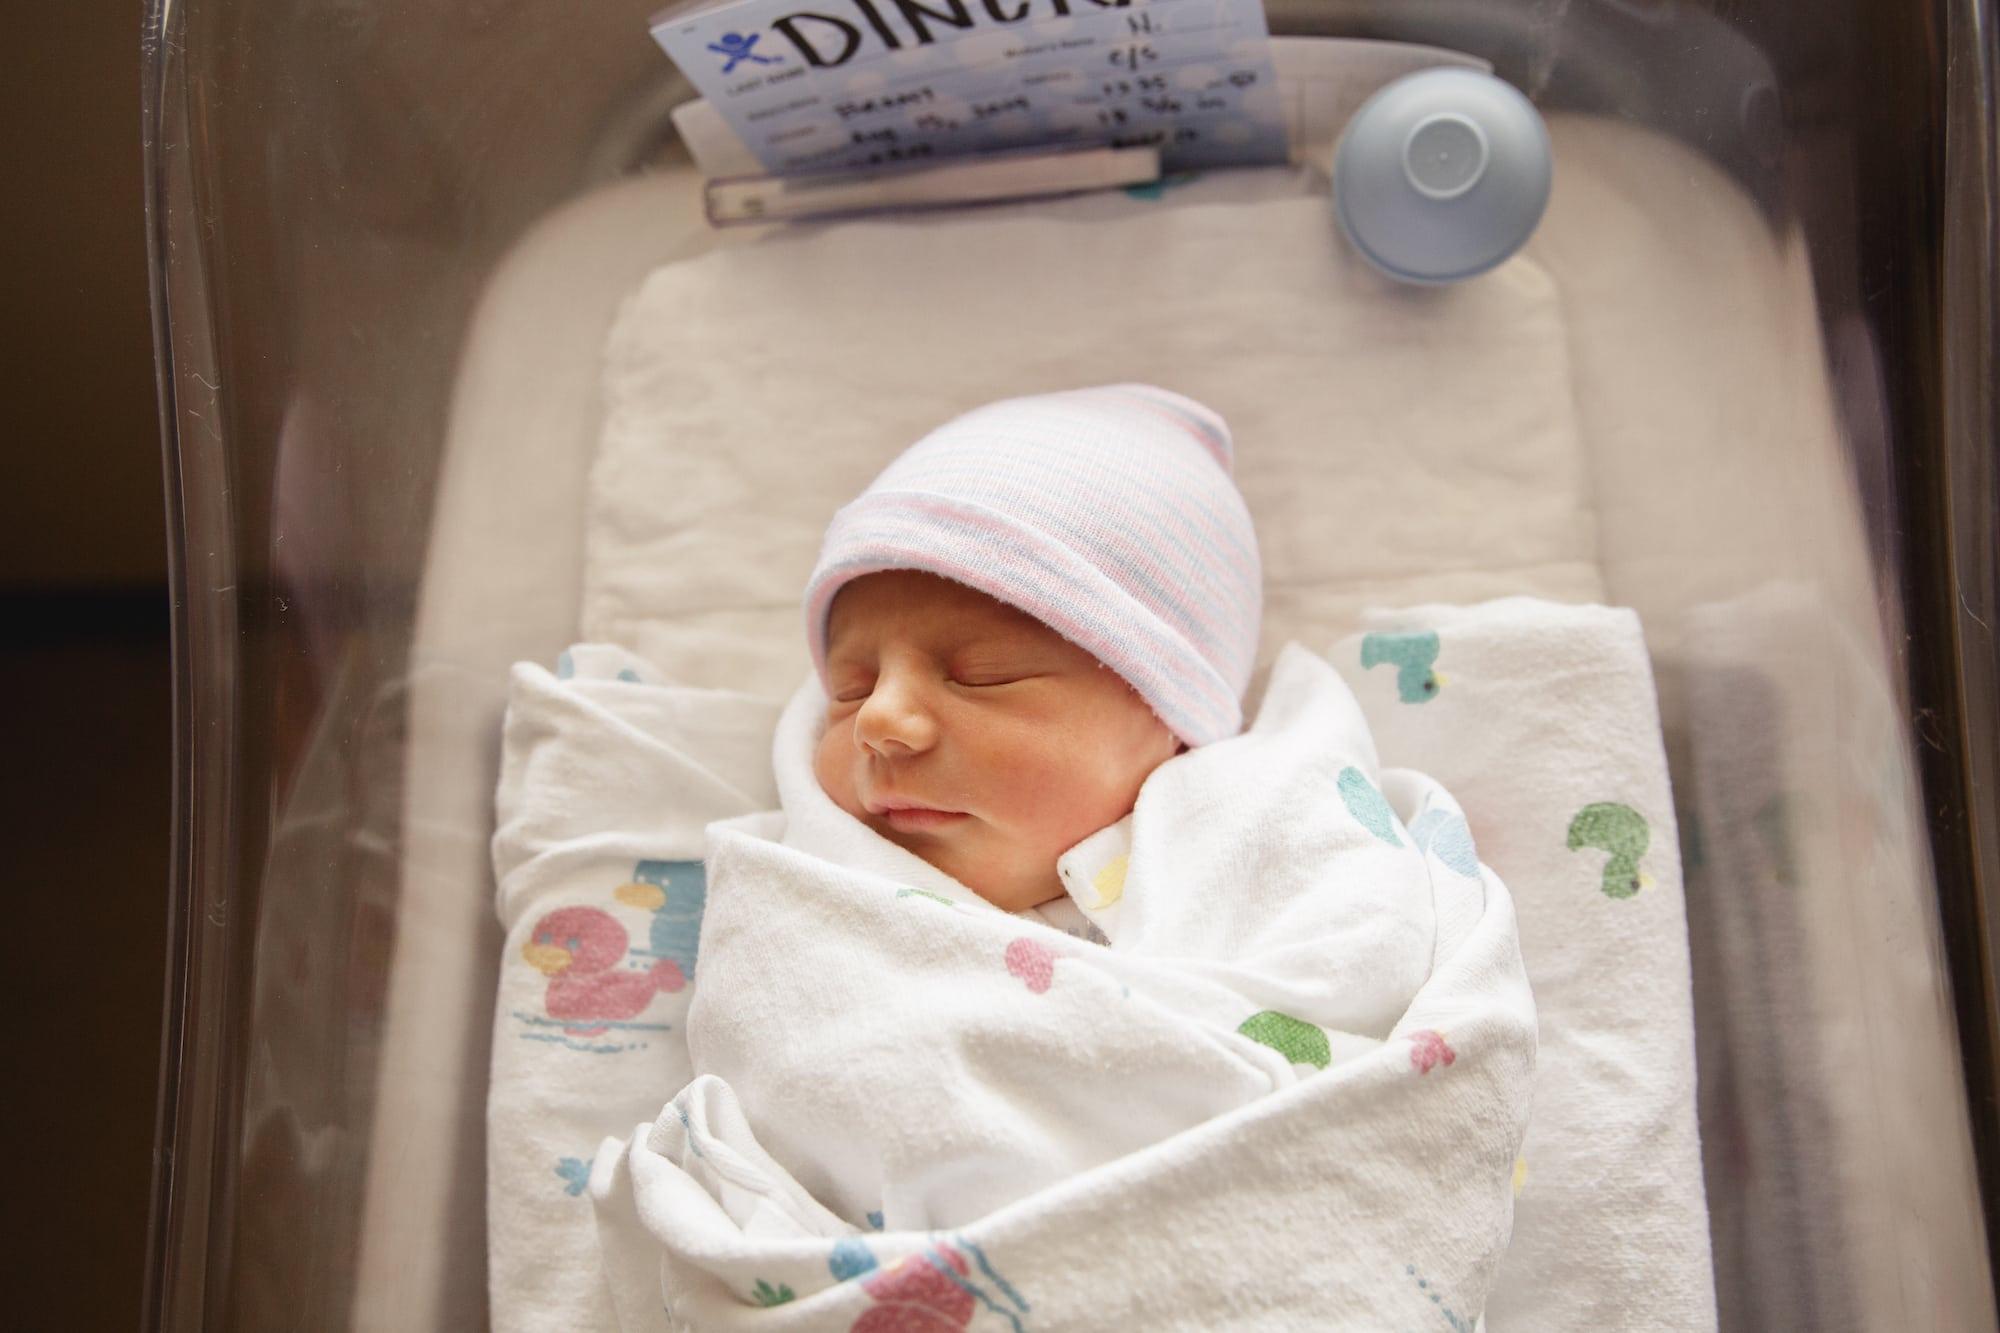 Newborn in hospital bassinet